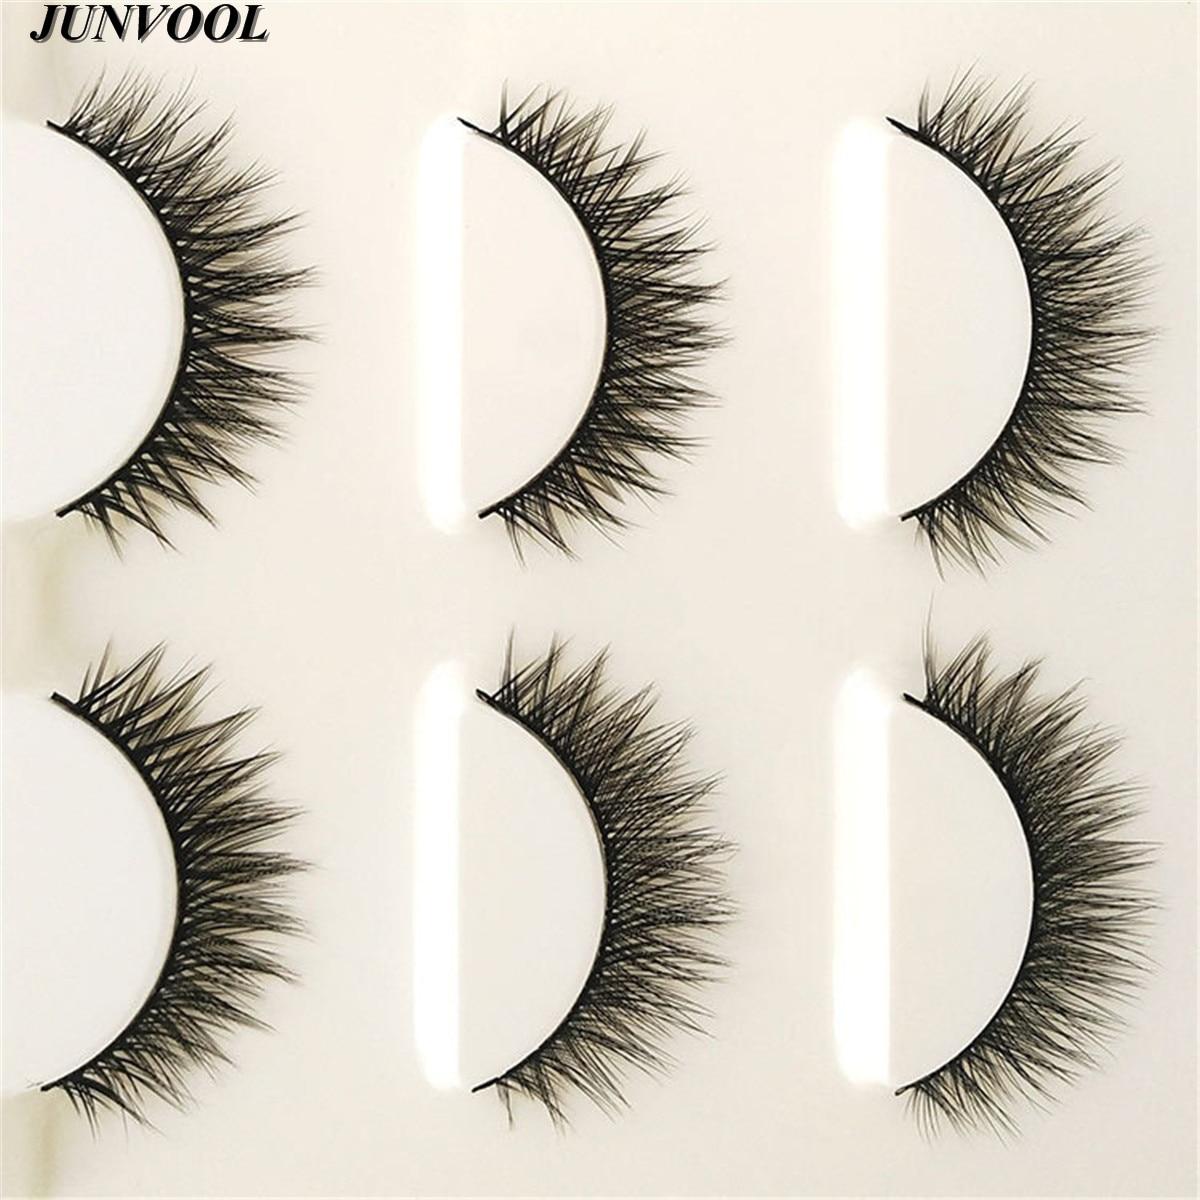 Ekstensi bulu mata, 15 Pairs buatan tangan 3D Mink rambut, Kecantikan - Riasan - Foto 2